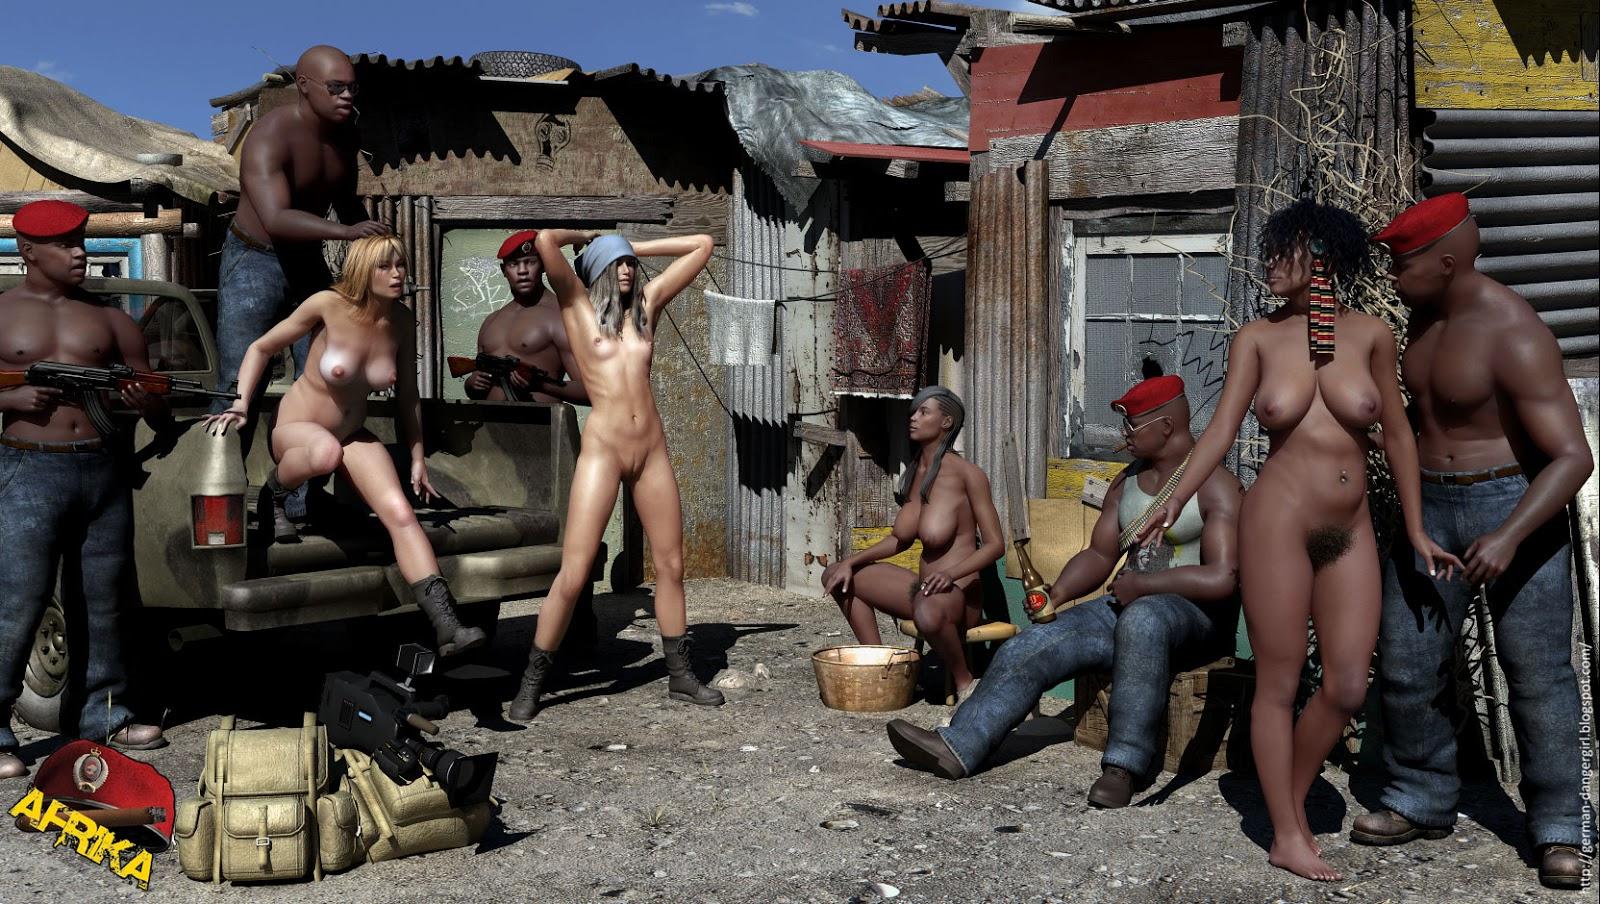 Nude girls slave market pics hentai tubes